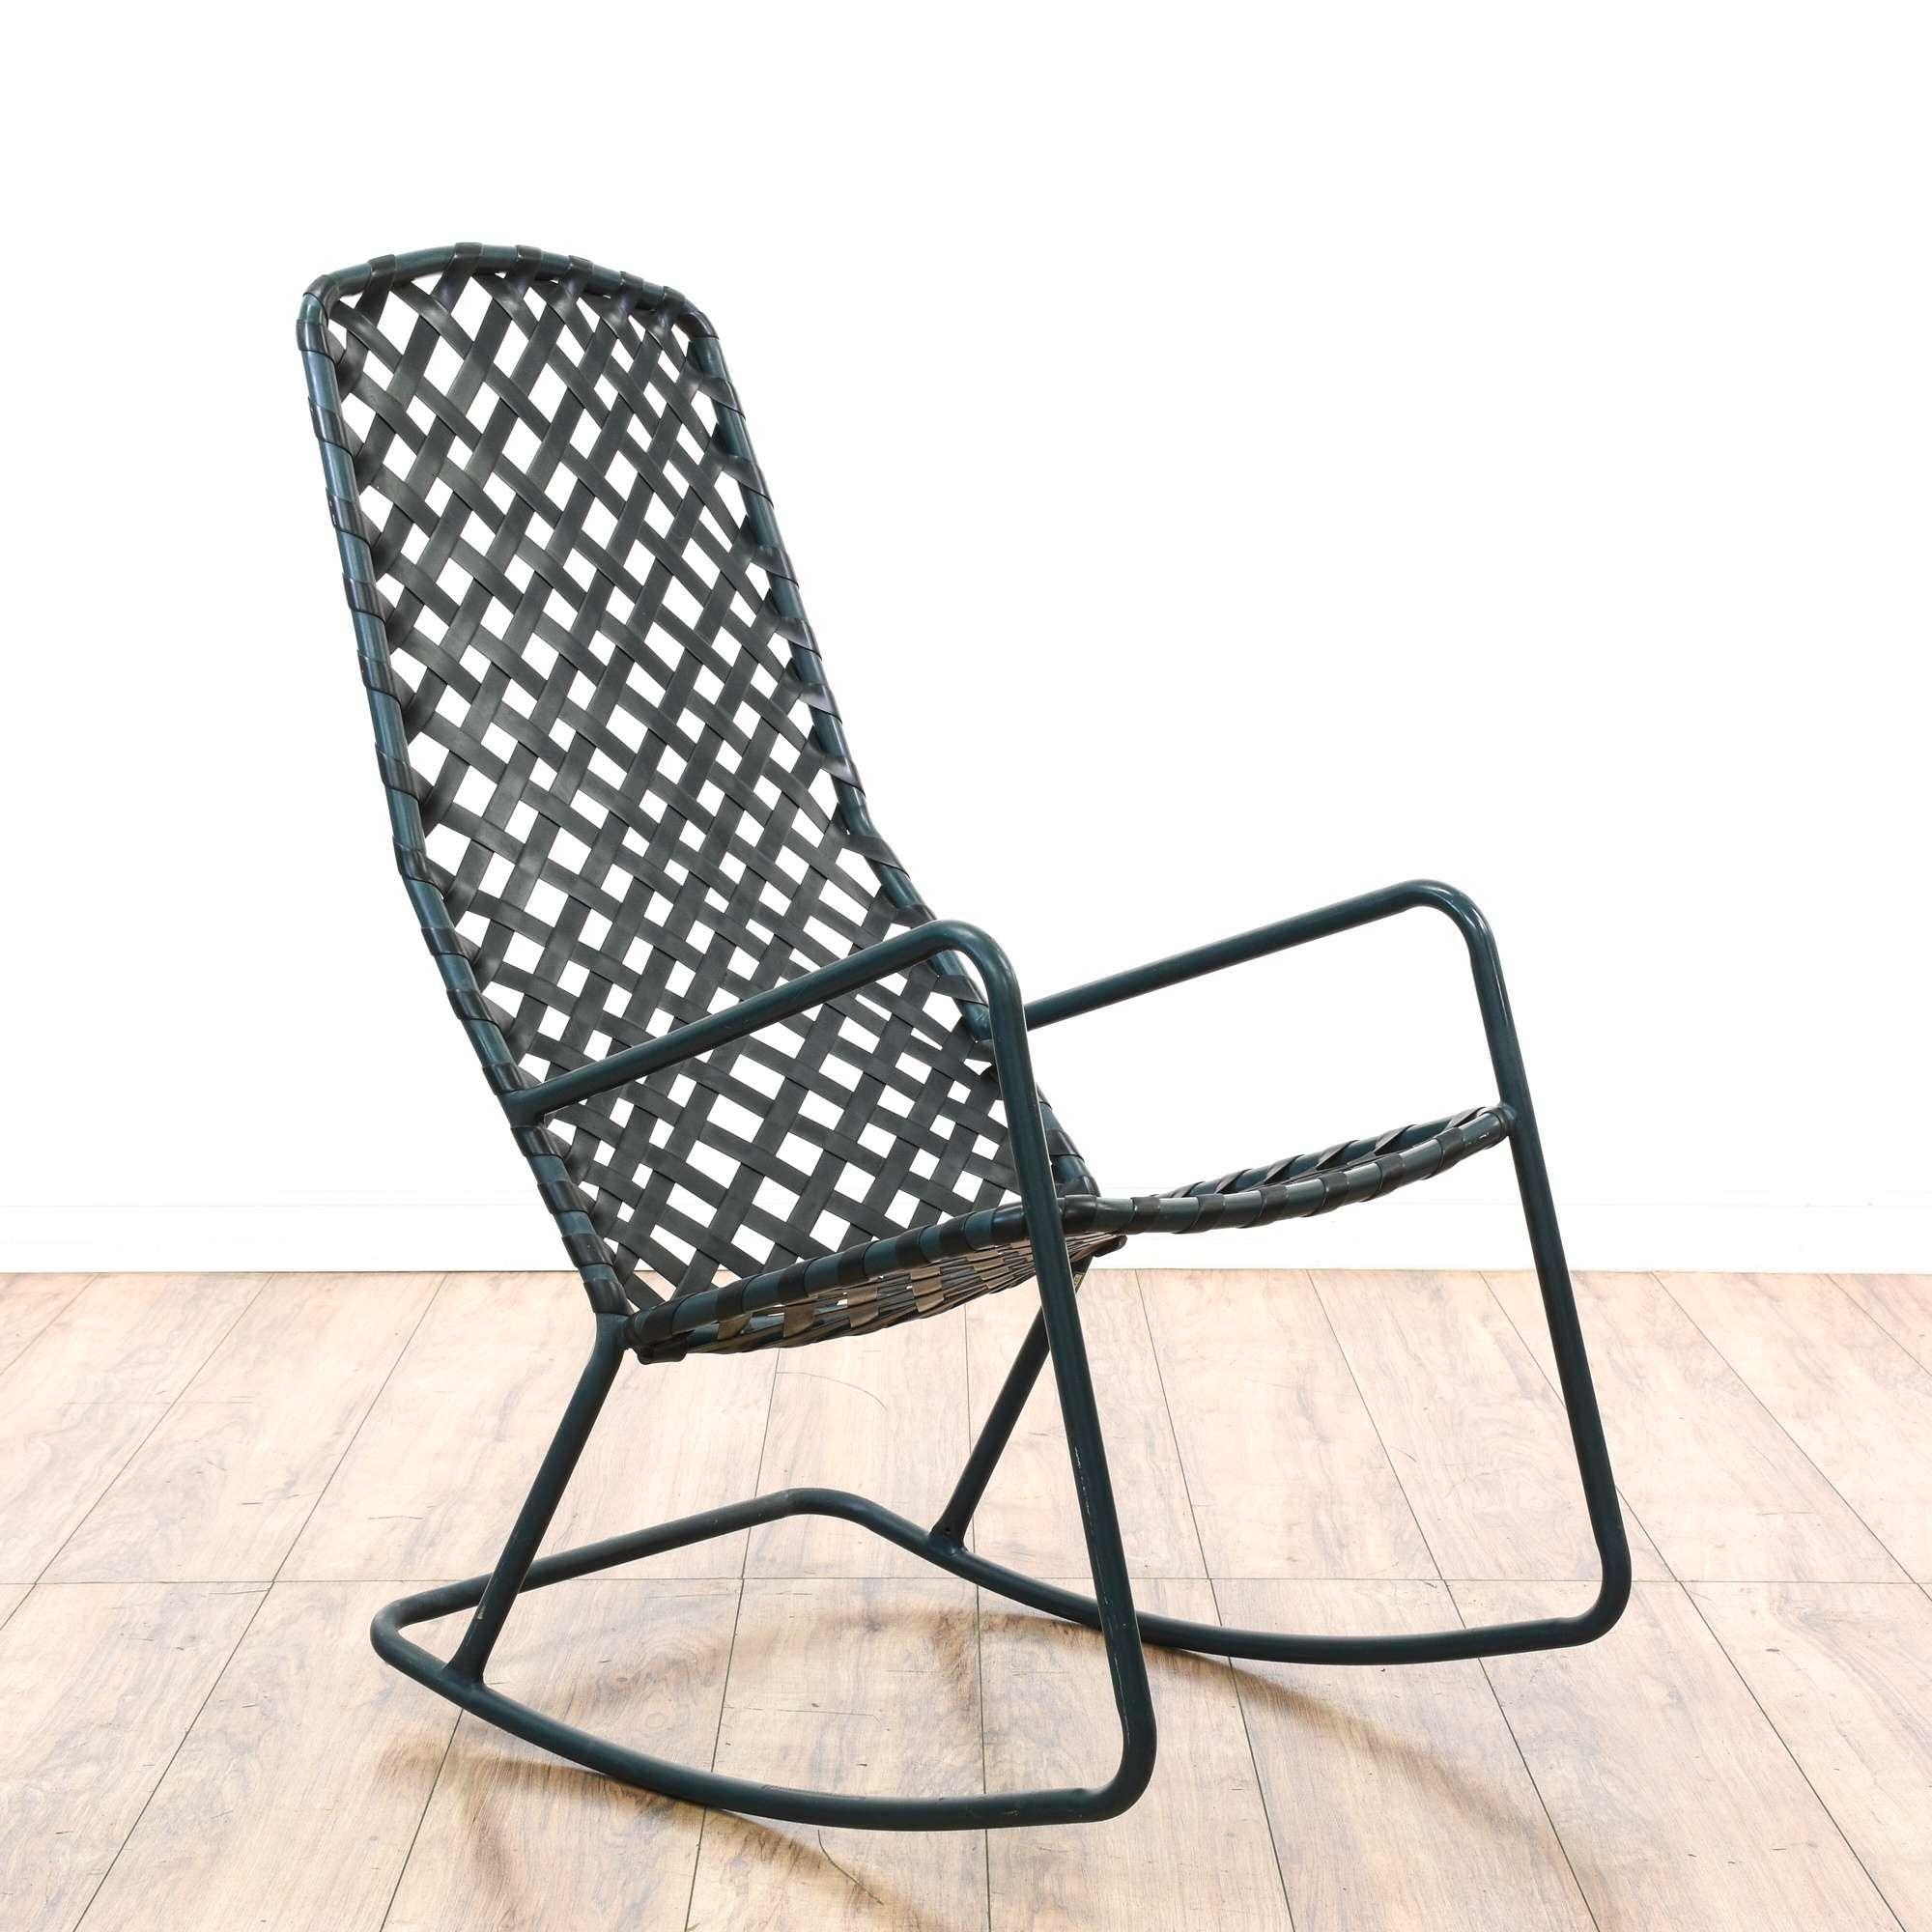 Excellent Brown Jordan Tamiami Metal Outdoor Rocking Chair Loveseat Best Image Libraries Barepthycampuscom